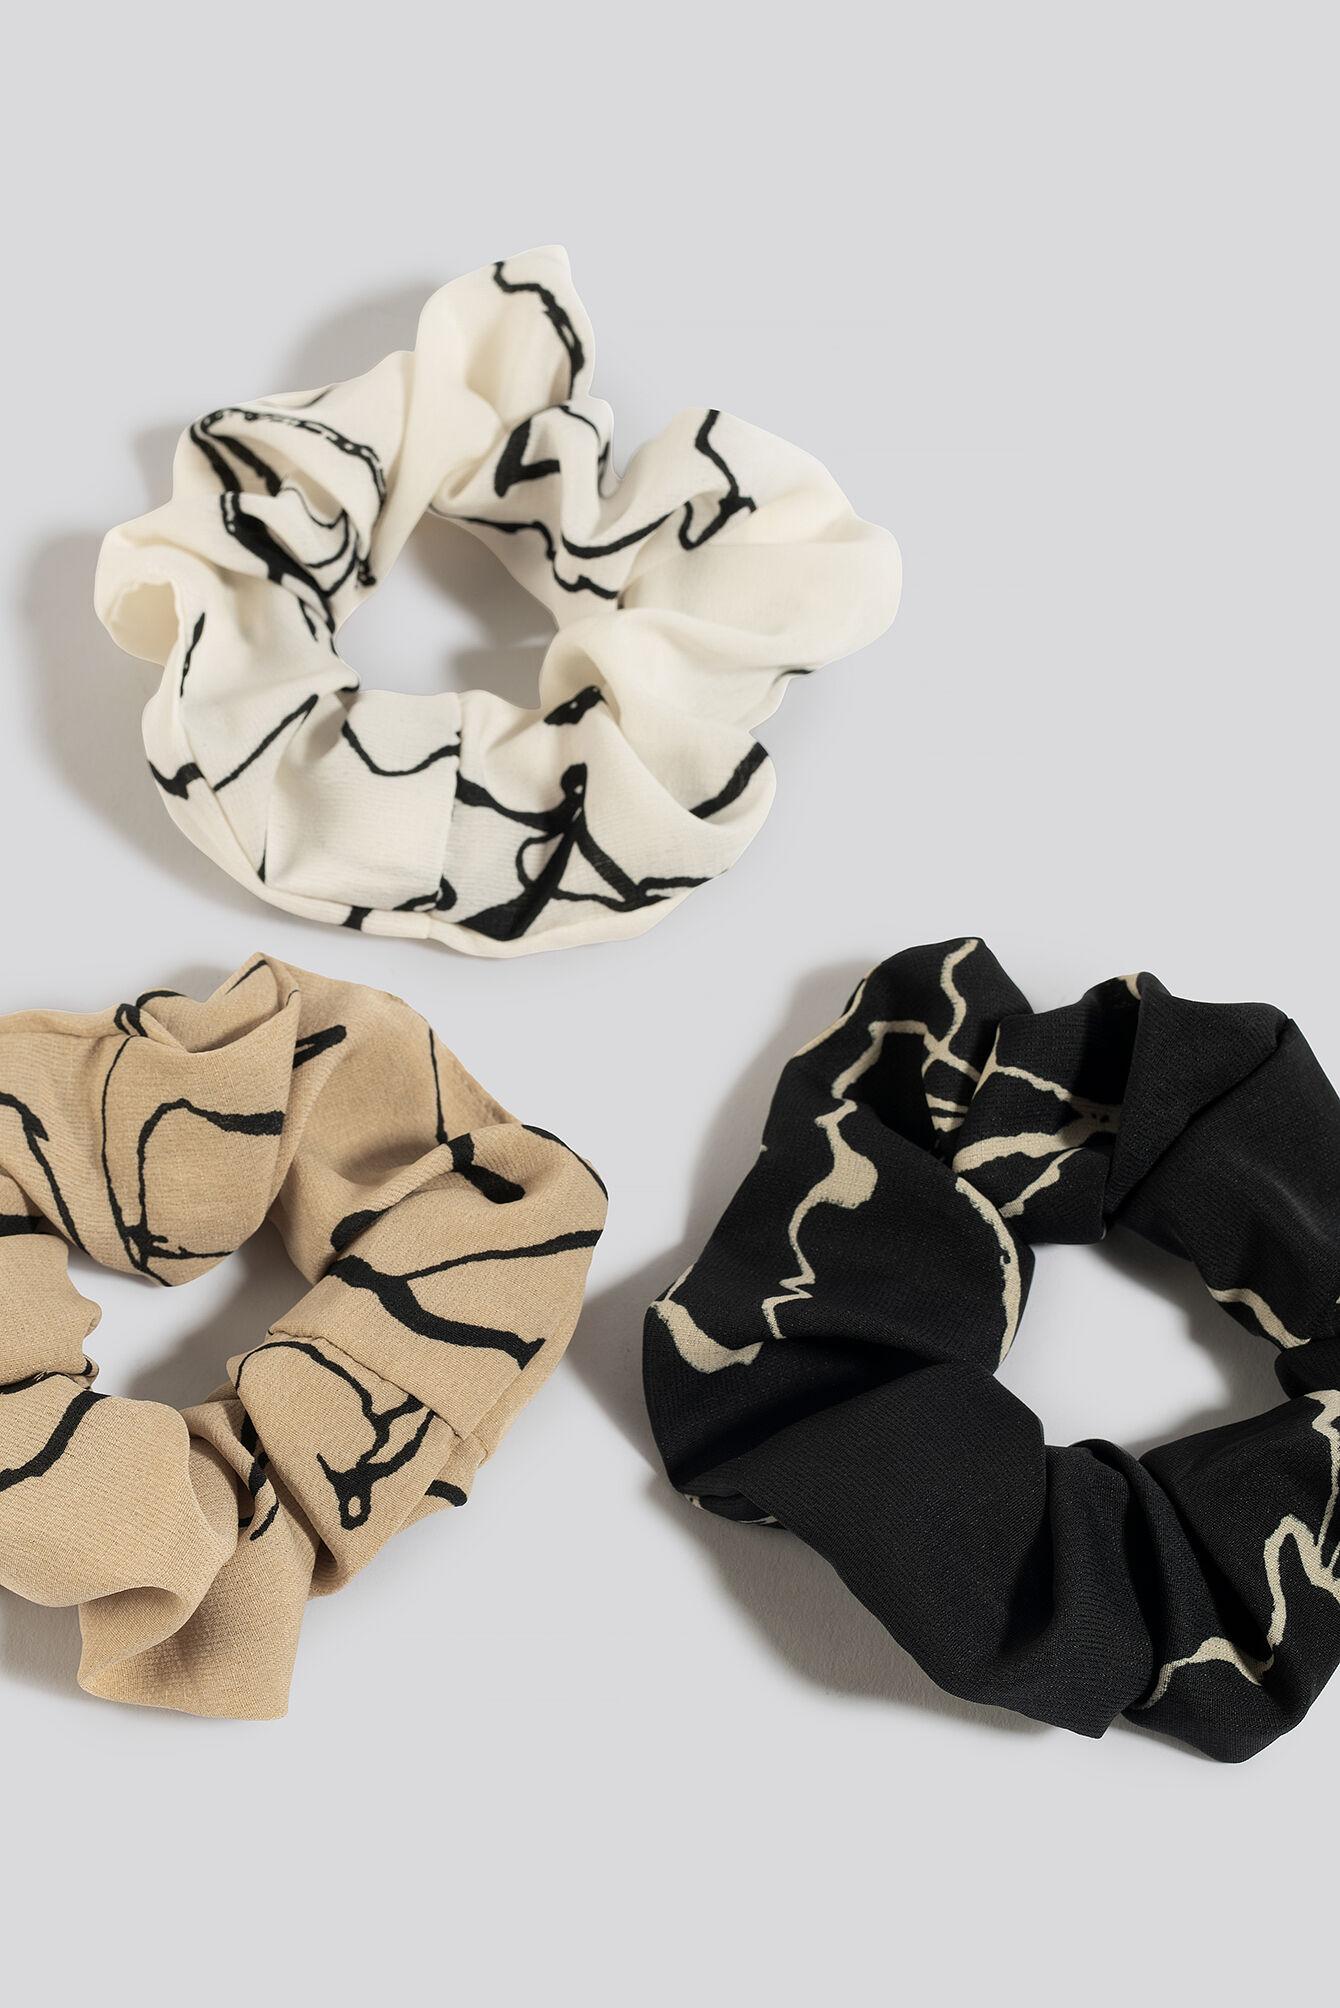 Image of NA-KD Accessories 3-Pack Floral Ink Print Scrunchies - Black,Brown,White,Beige